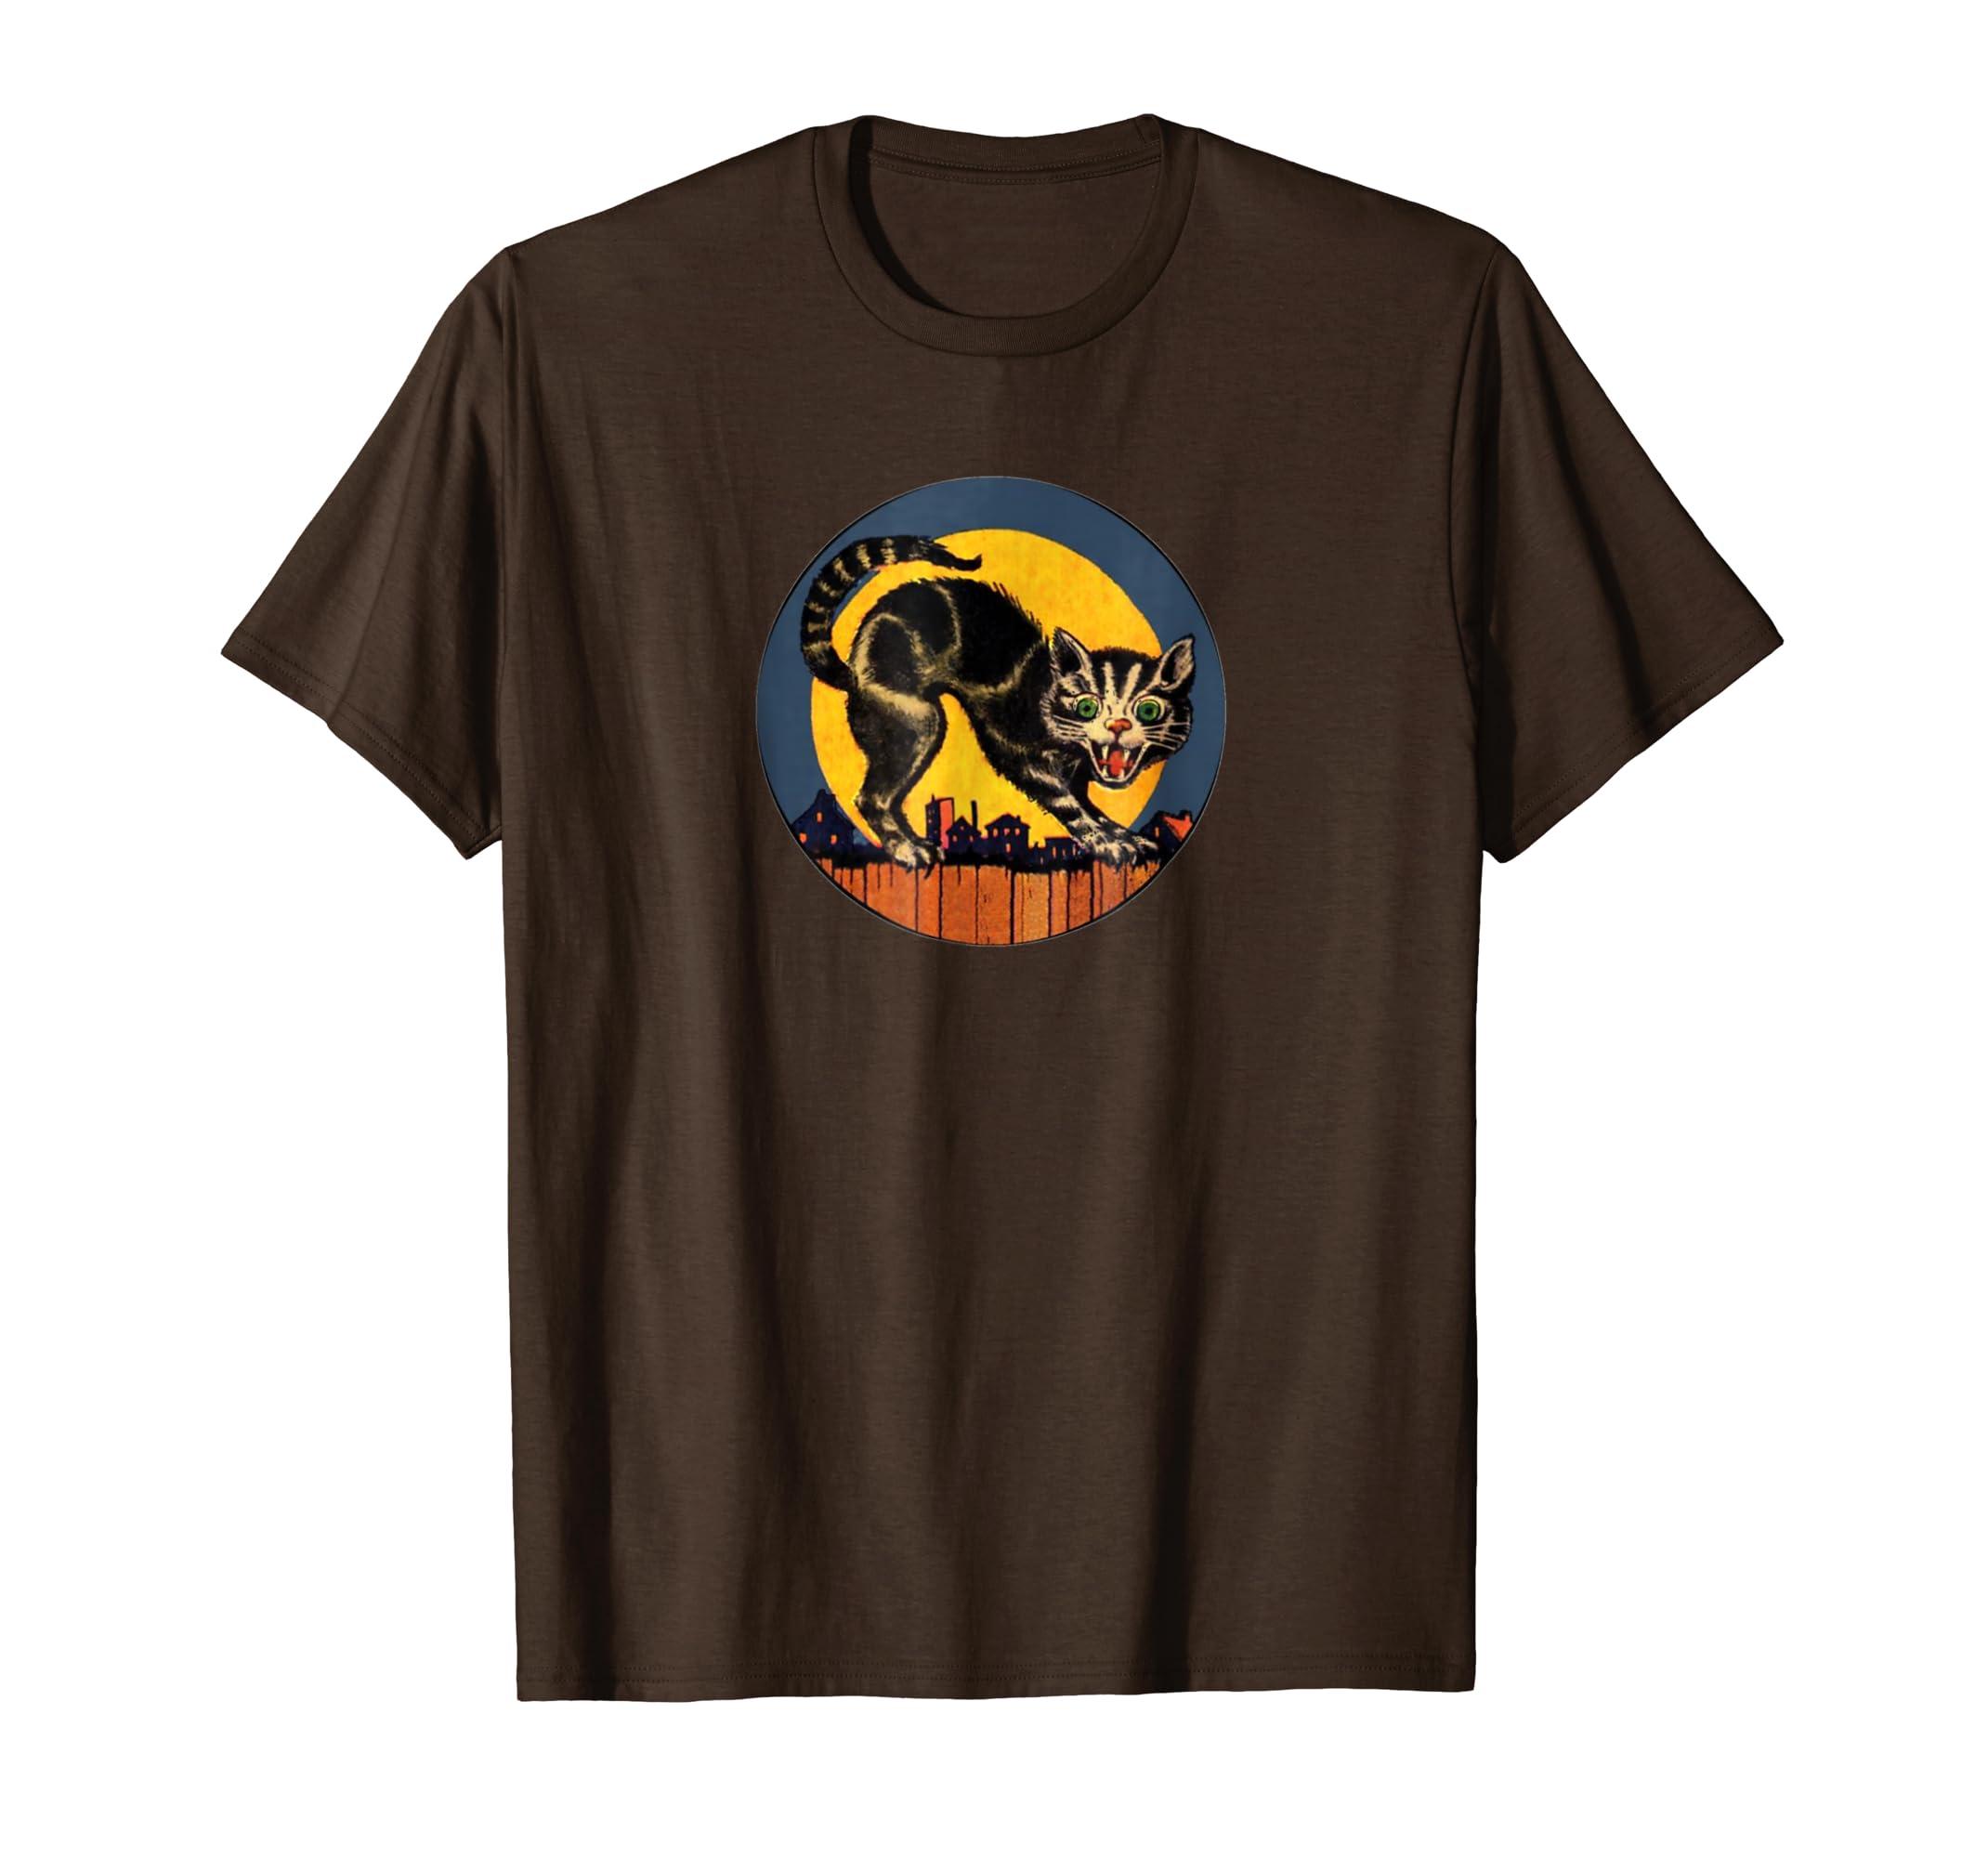 Vintage Halloween Cat T Shirt It's retro spooky-Bawle